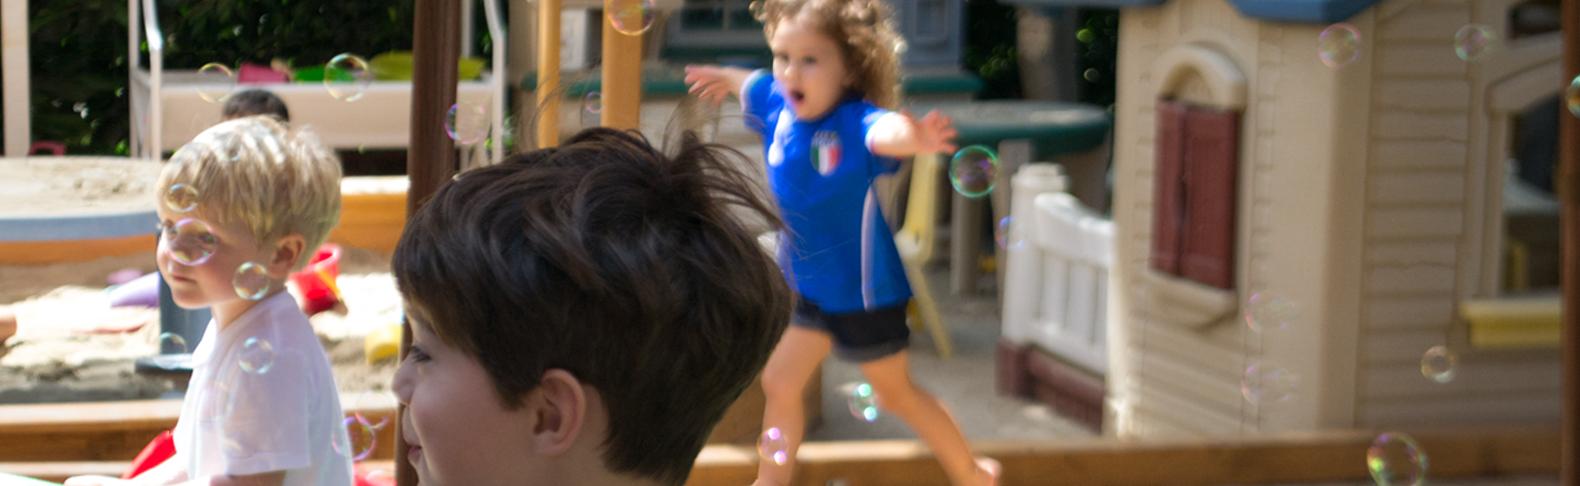 Montana Preschool -Santa Monica, Ca 90402